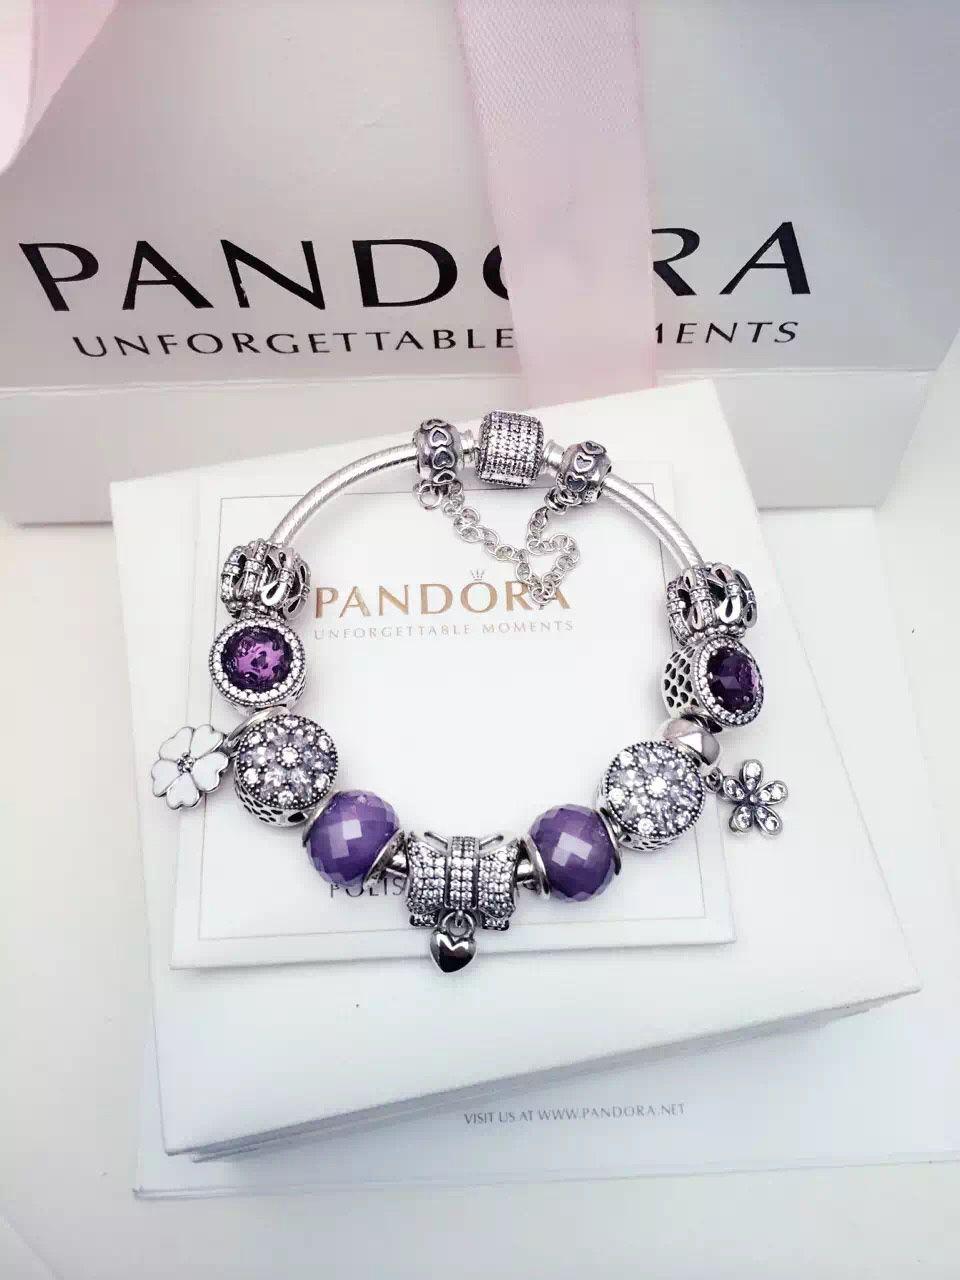 50 Off 299 Pandora Charm Bracelet Purple White Hot Sale Sku Cb02089 Pandora Bracelet Id Pandora Bracelet Designs Pandora Jewelry Box Pandora Charms